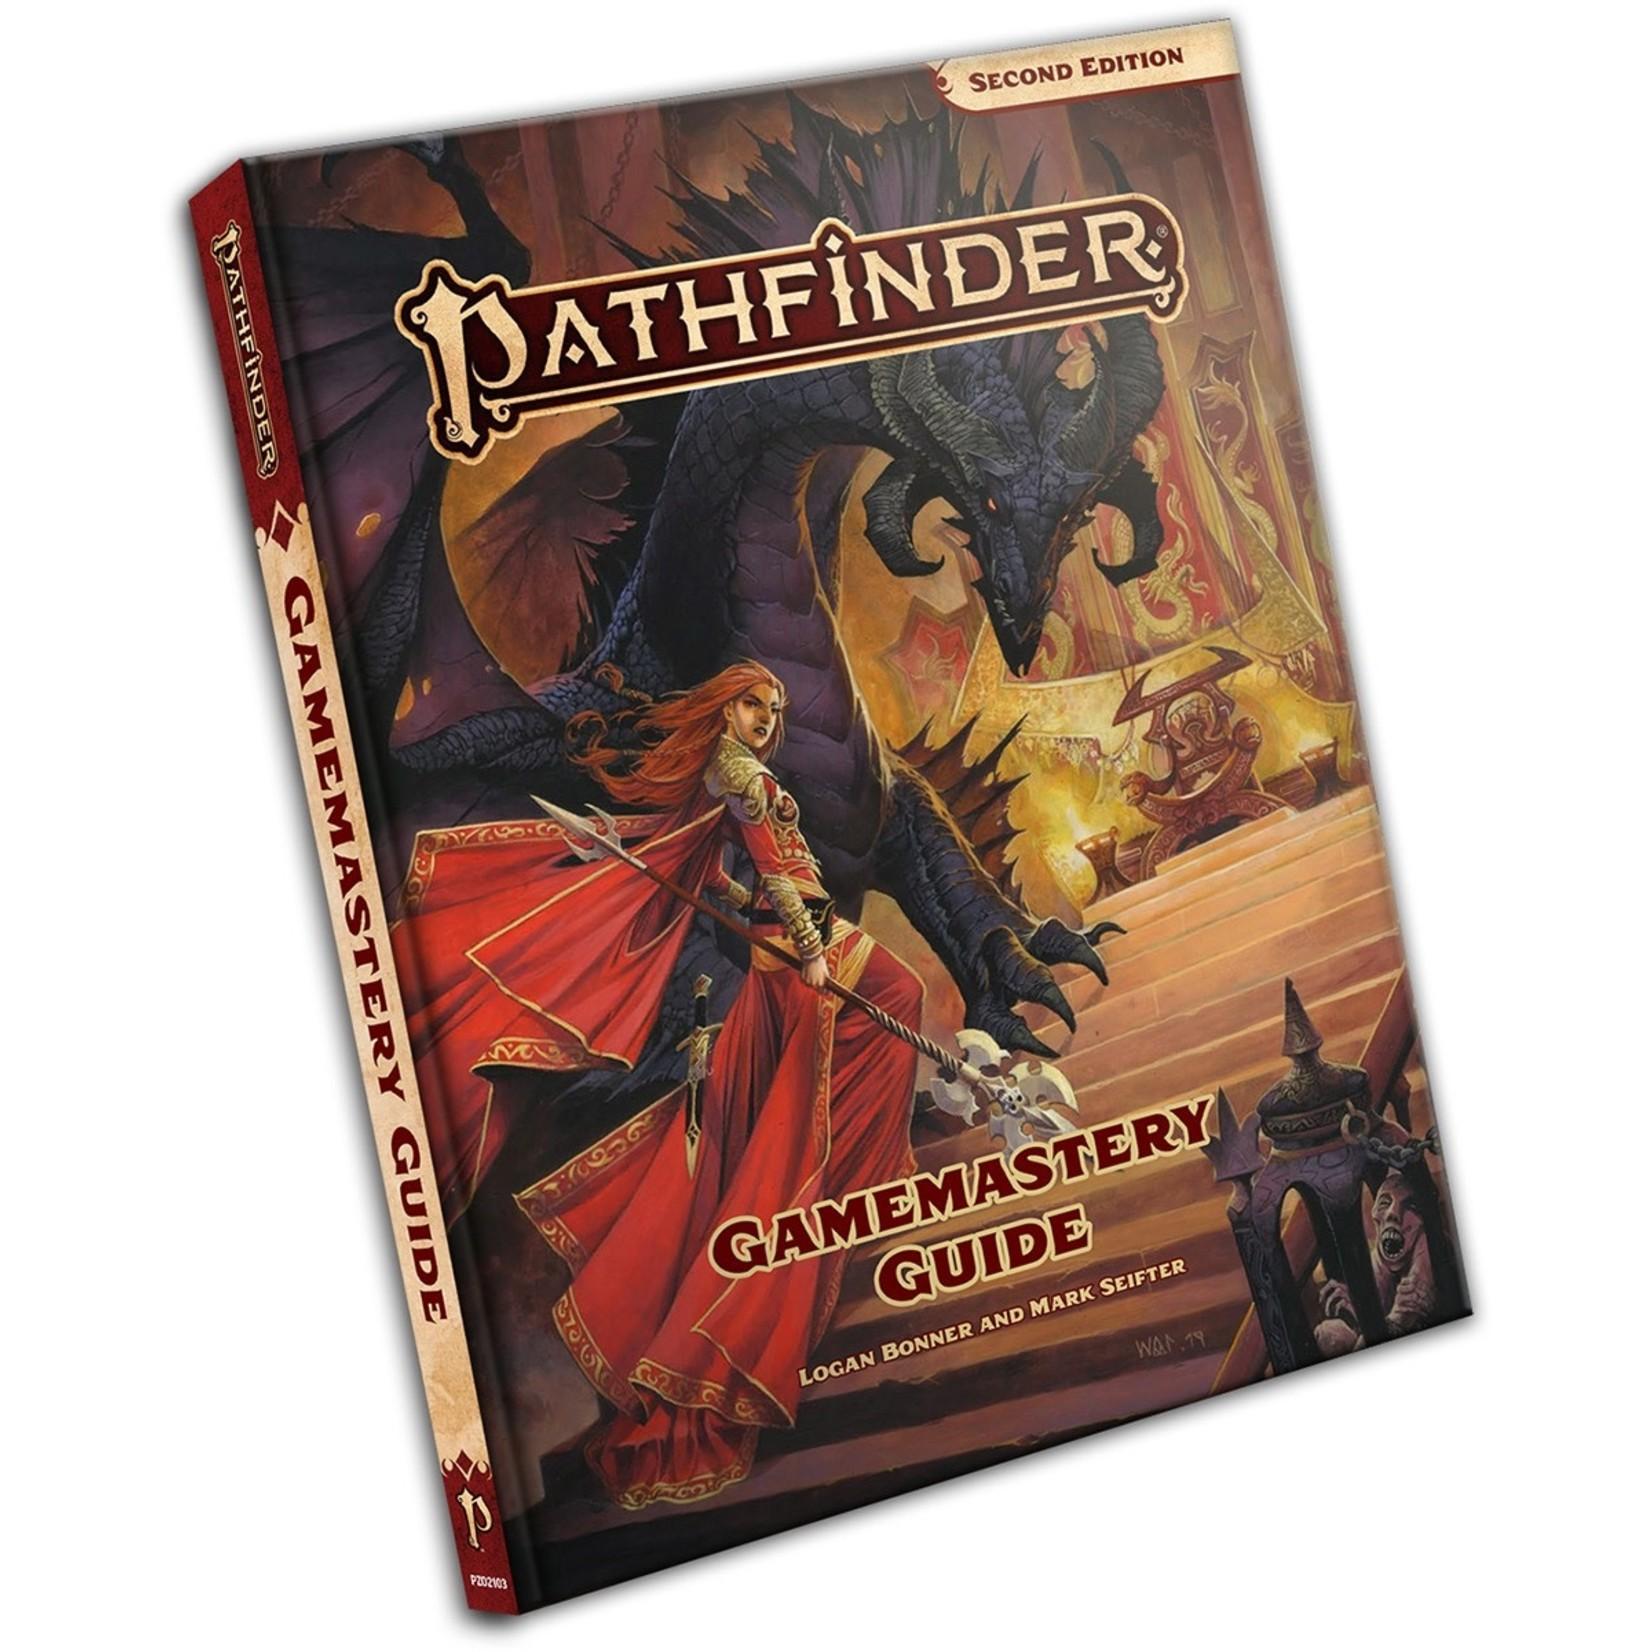 Paizo Pathfinder Second Edition: Gamemastery Guide